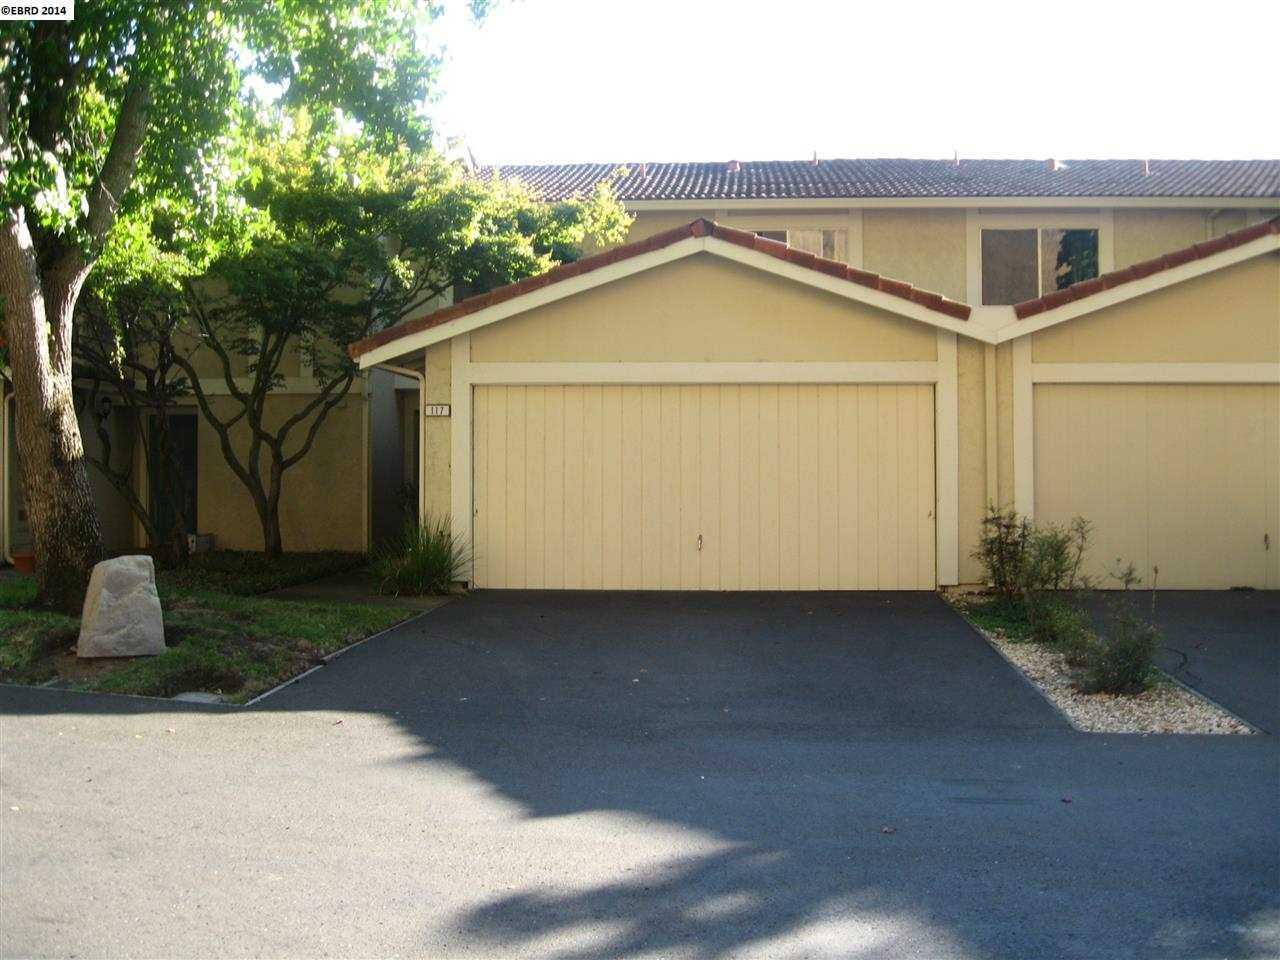 117 Thousand Oaks St Oakland, CA 94605